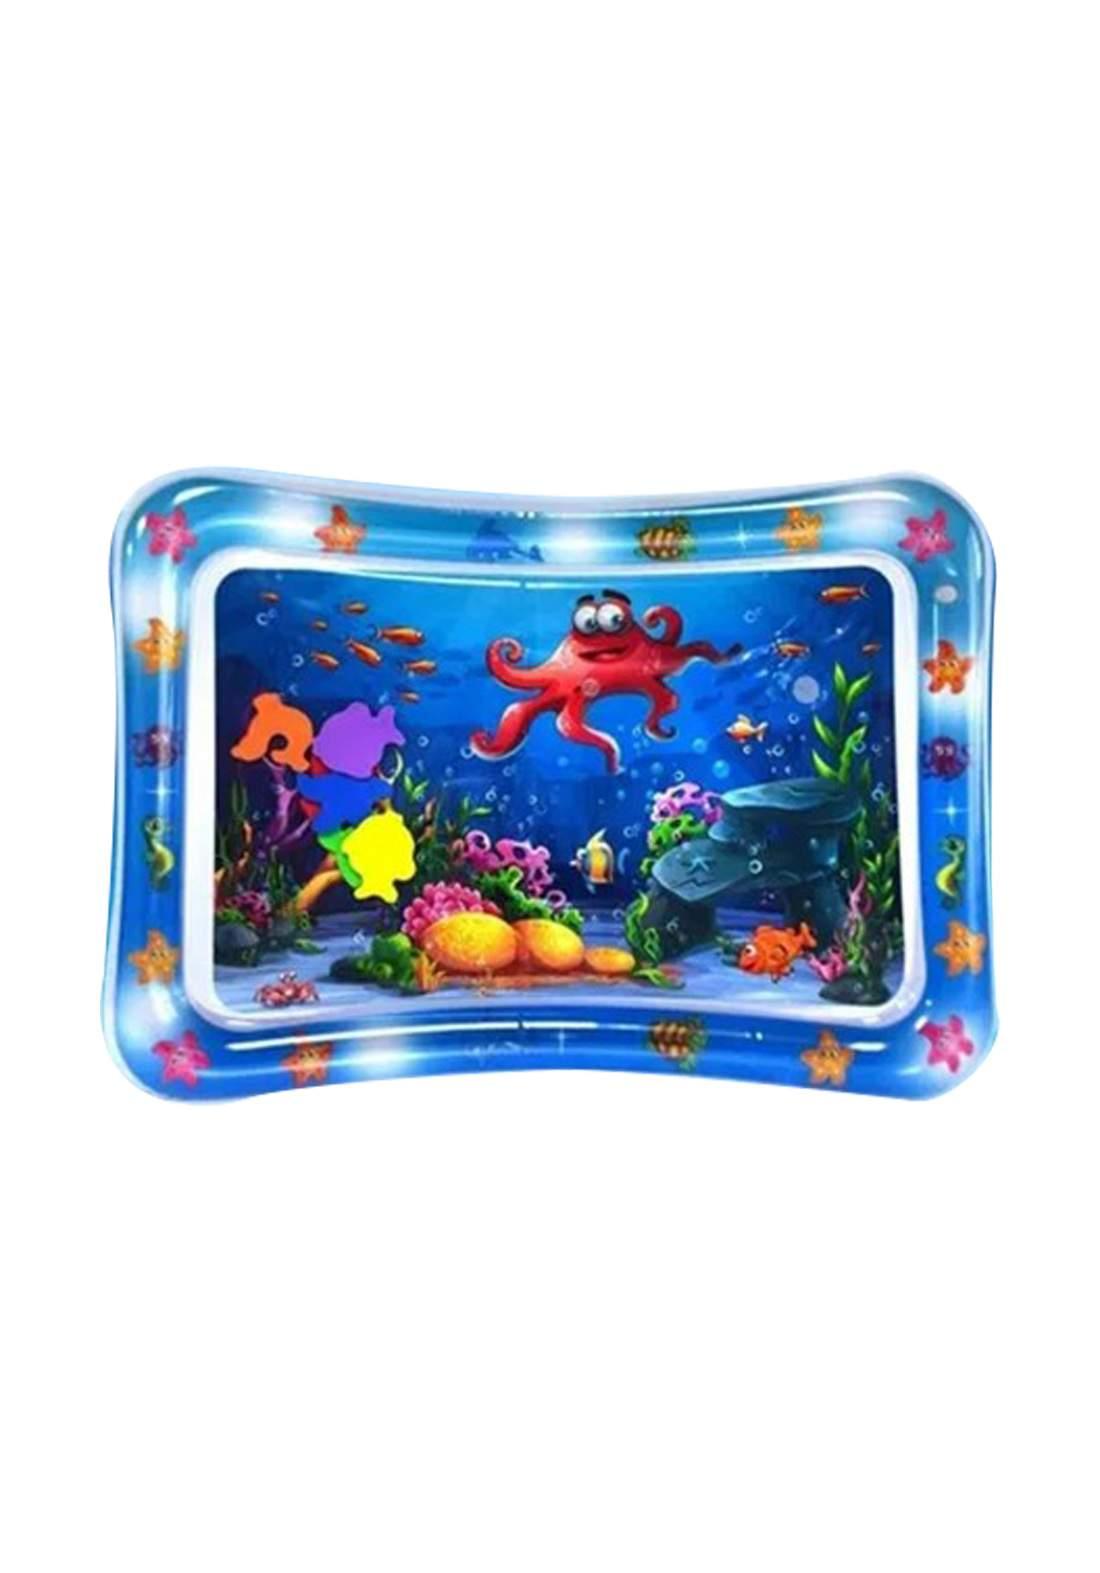 Inflatable Water Mat for Kids حوض مائي للأطفال